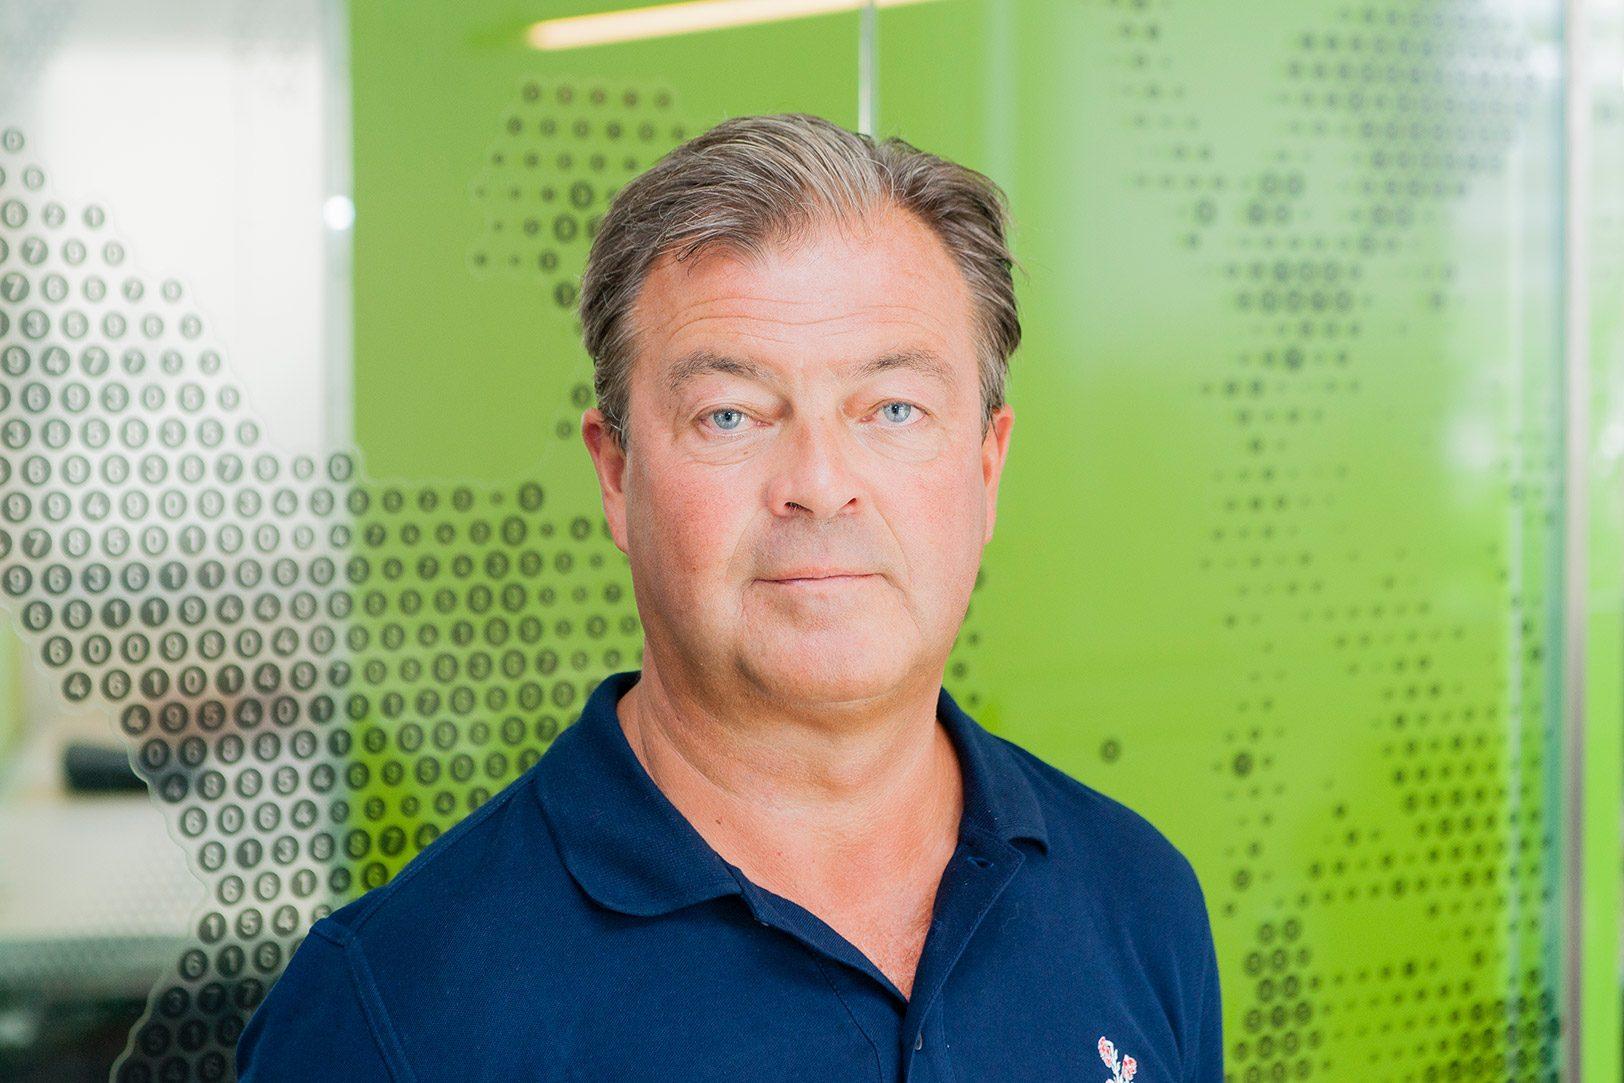 Lottoland CEO Nigel Birrell